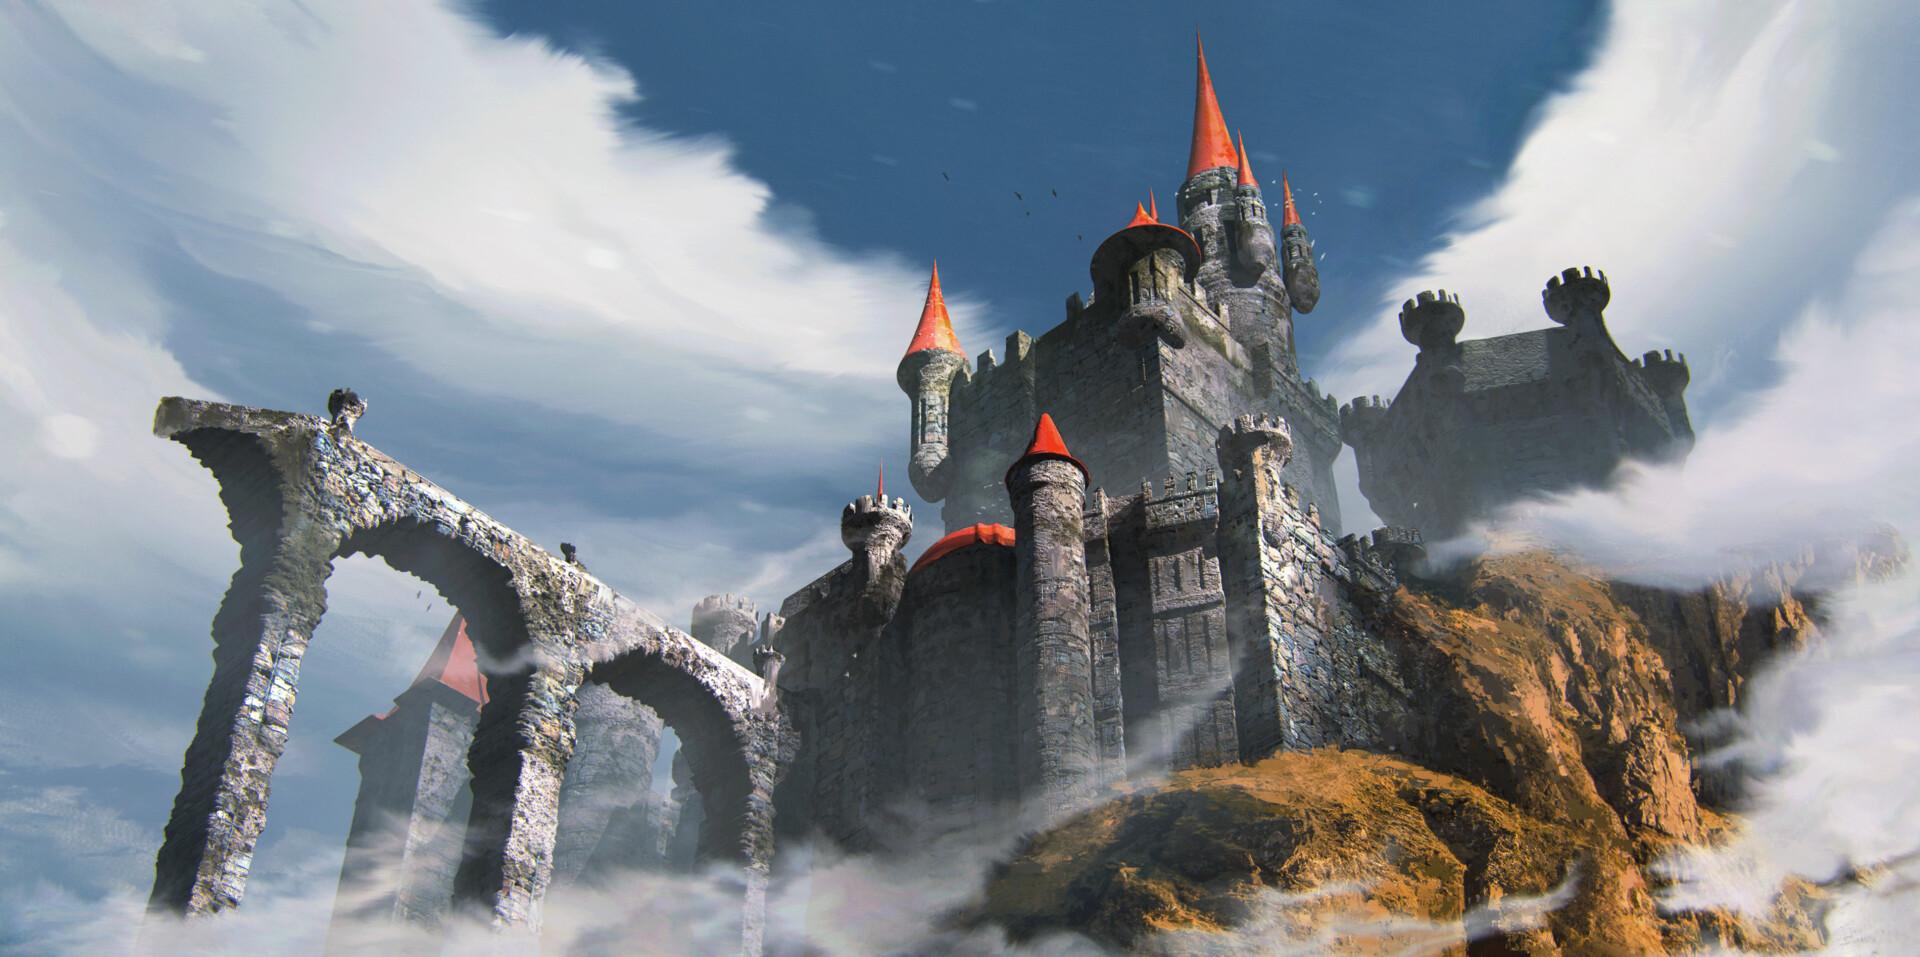 Helen ilnytska castle in the clouds 13